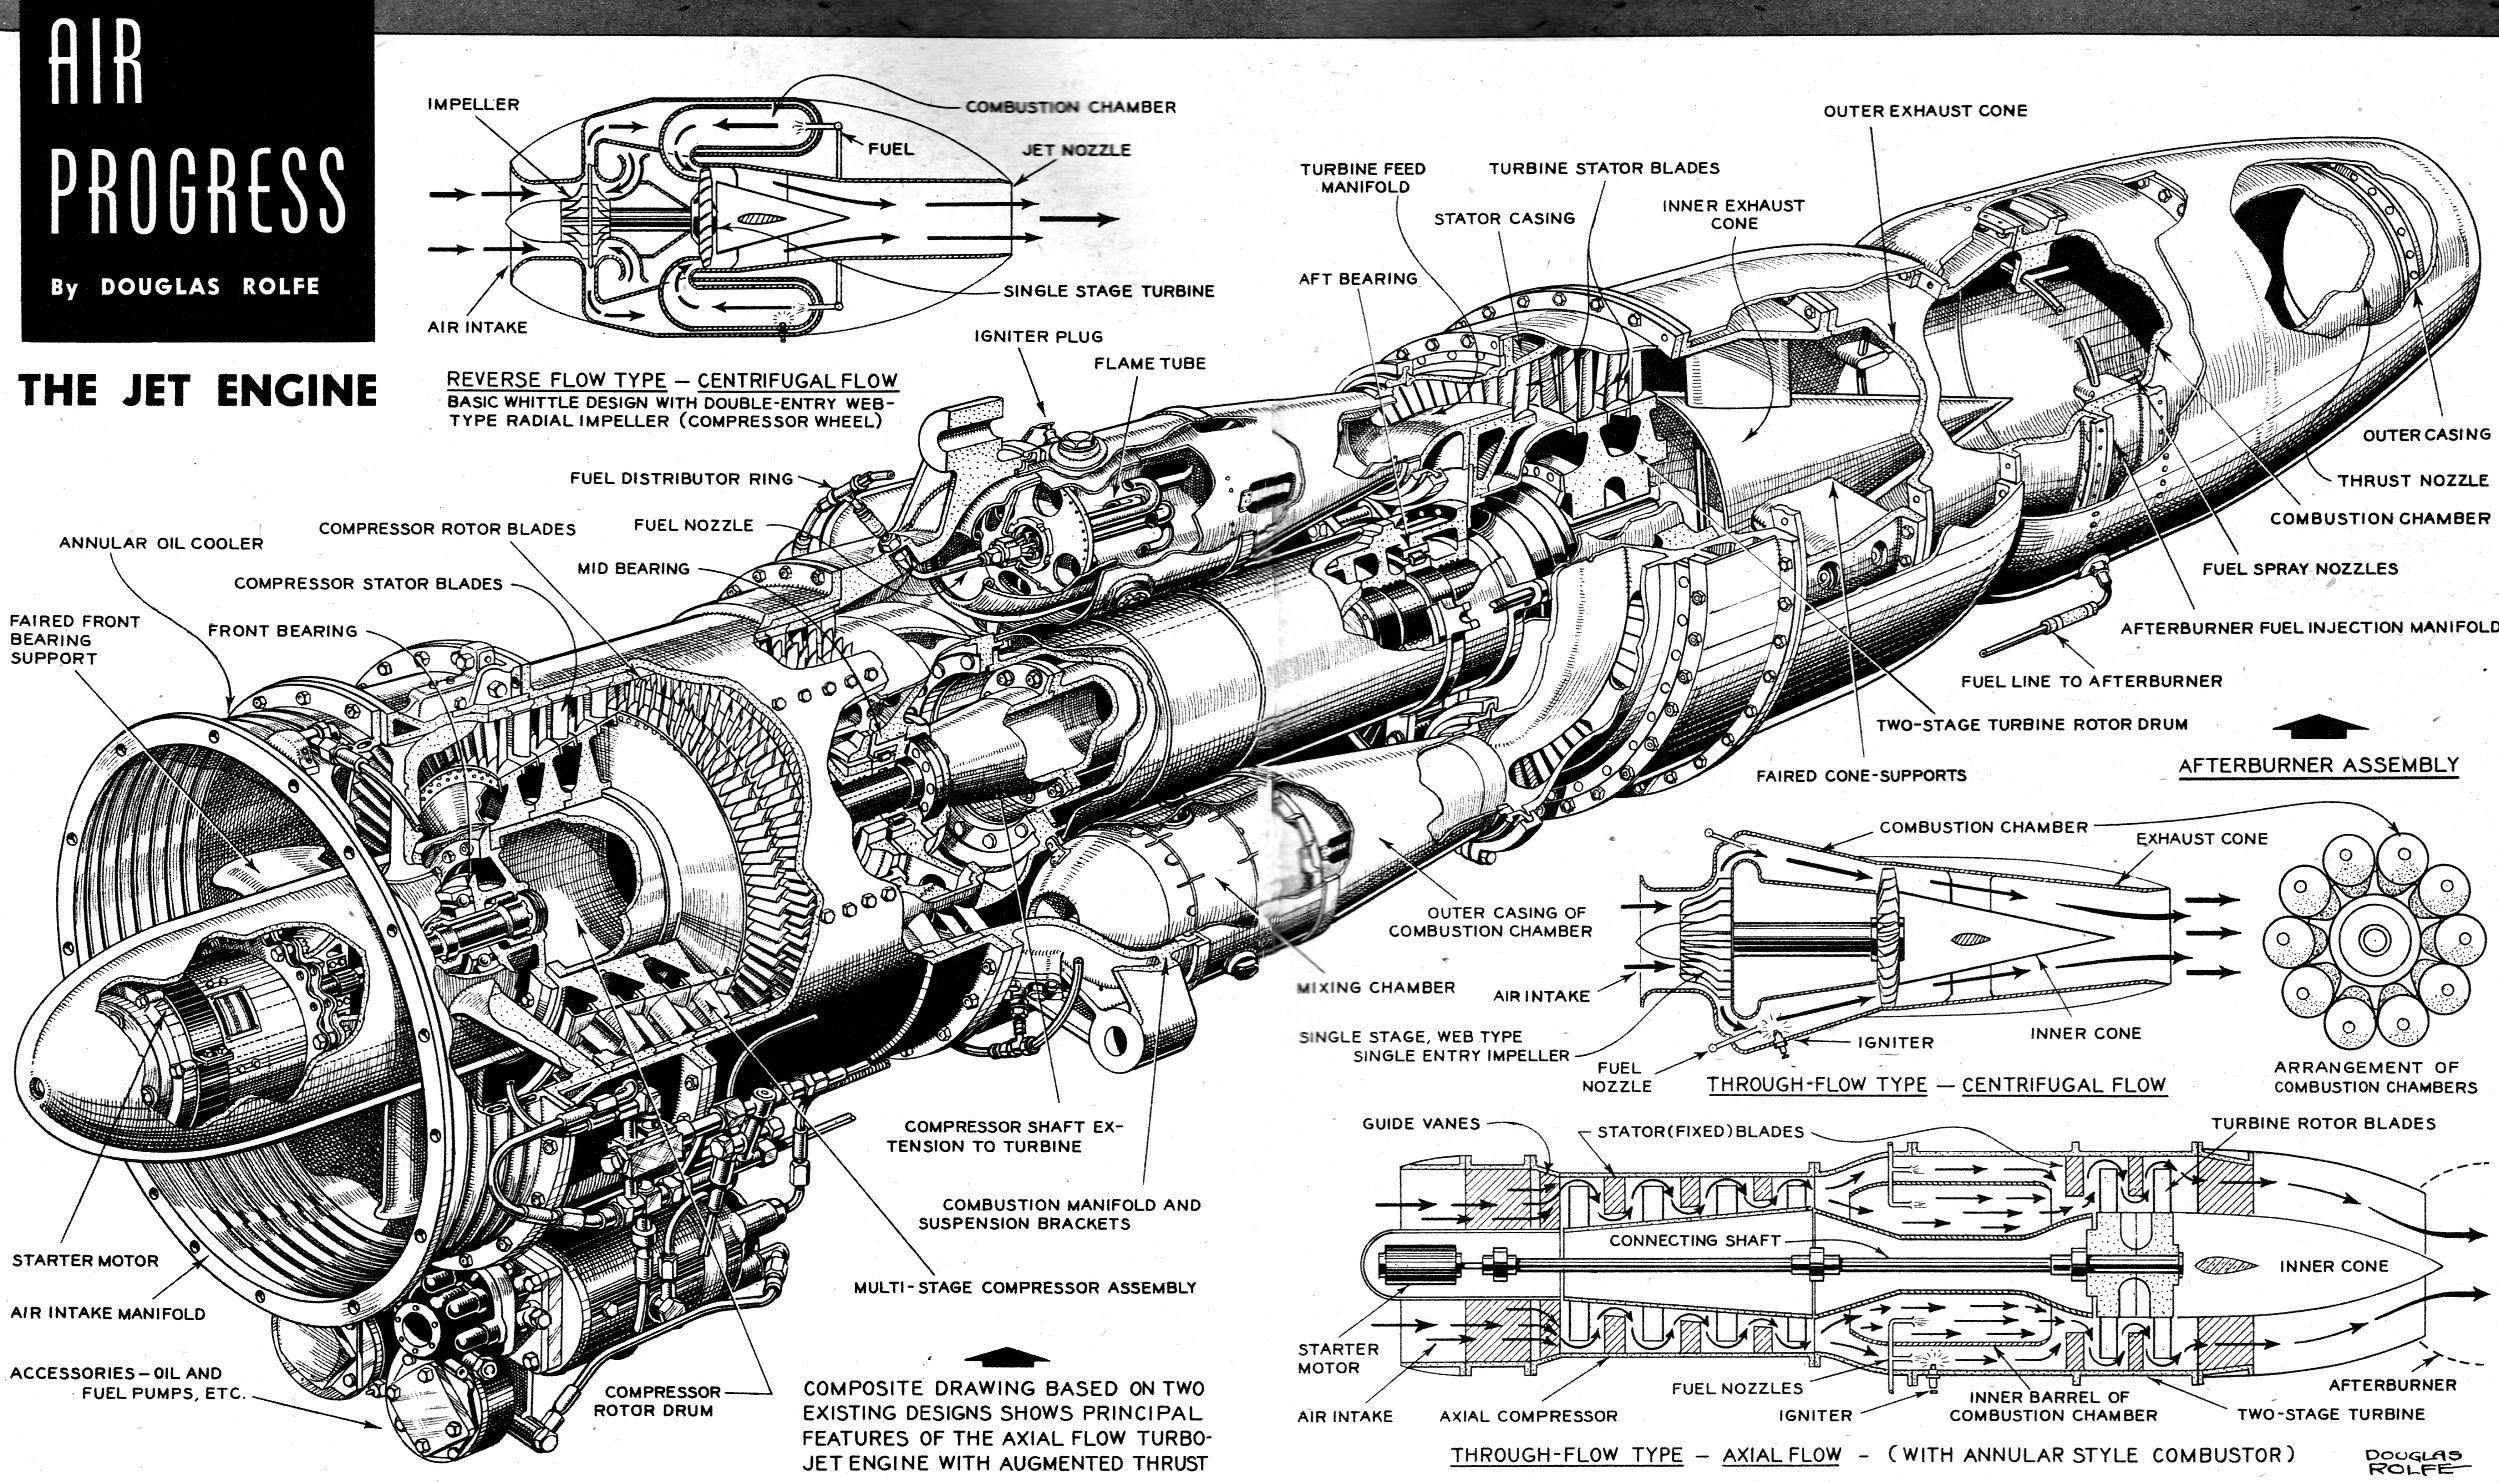 jet-turbine-engine-cross-section-air-trails-july-1951-2500x1482.jpg  2,499×1,482 pixels